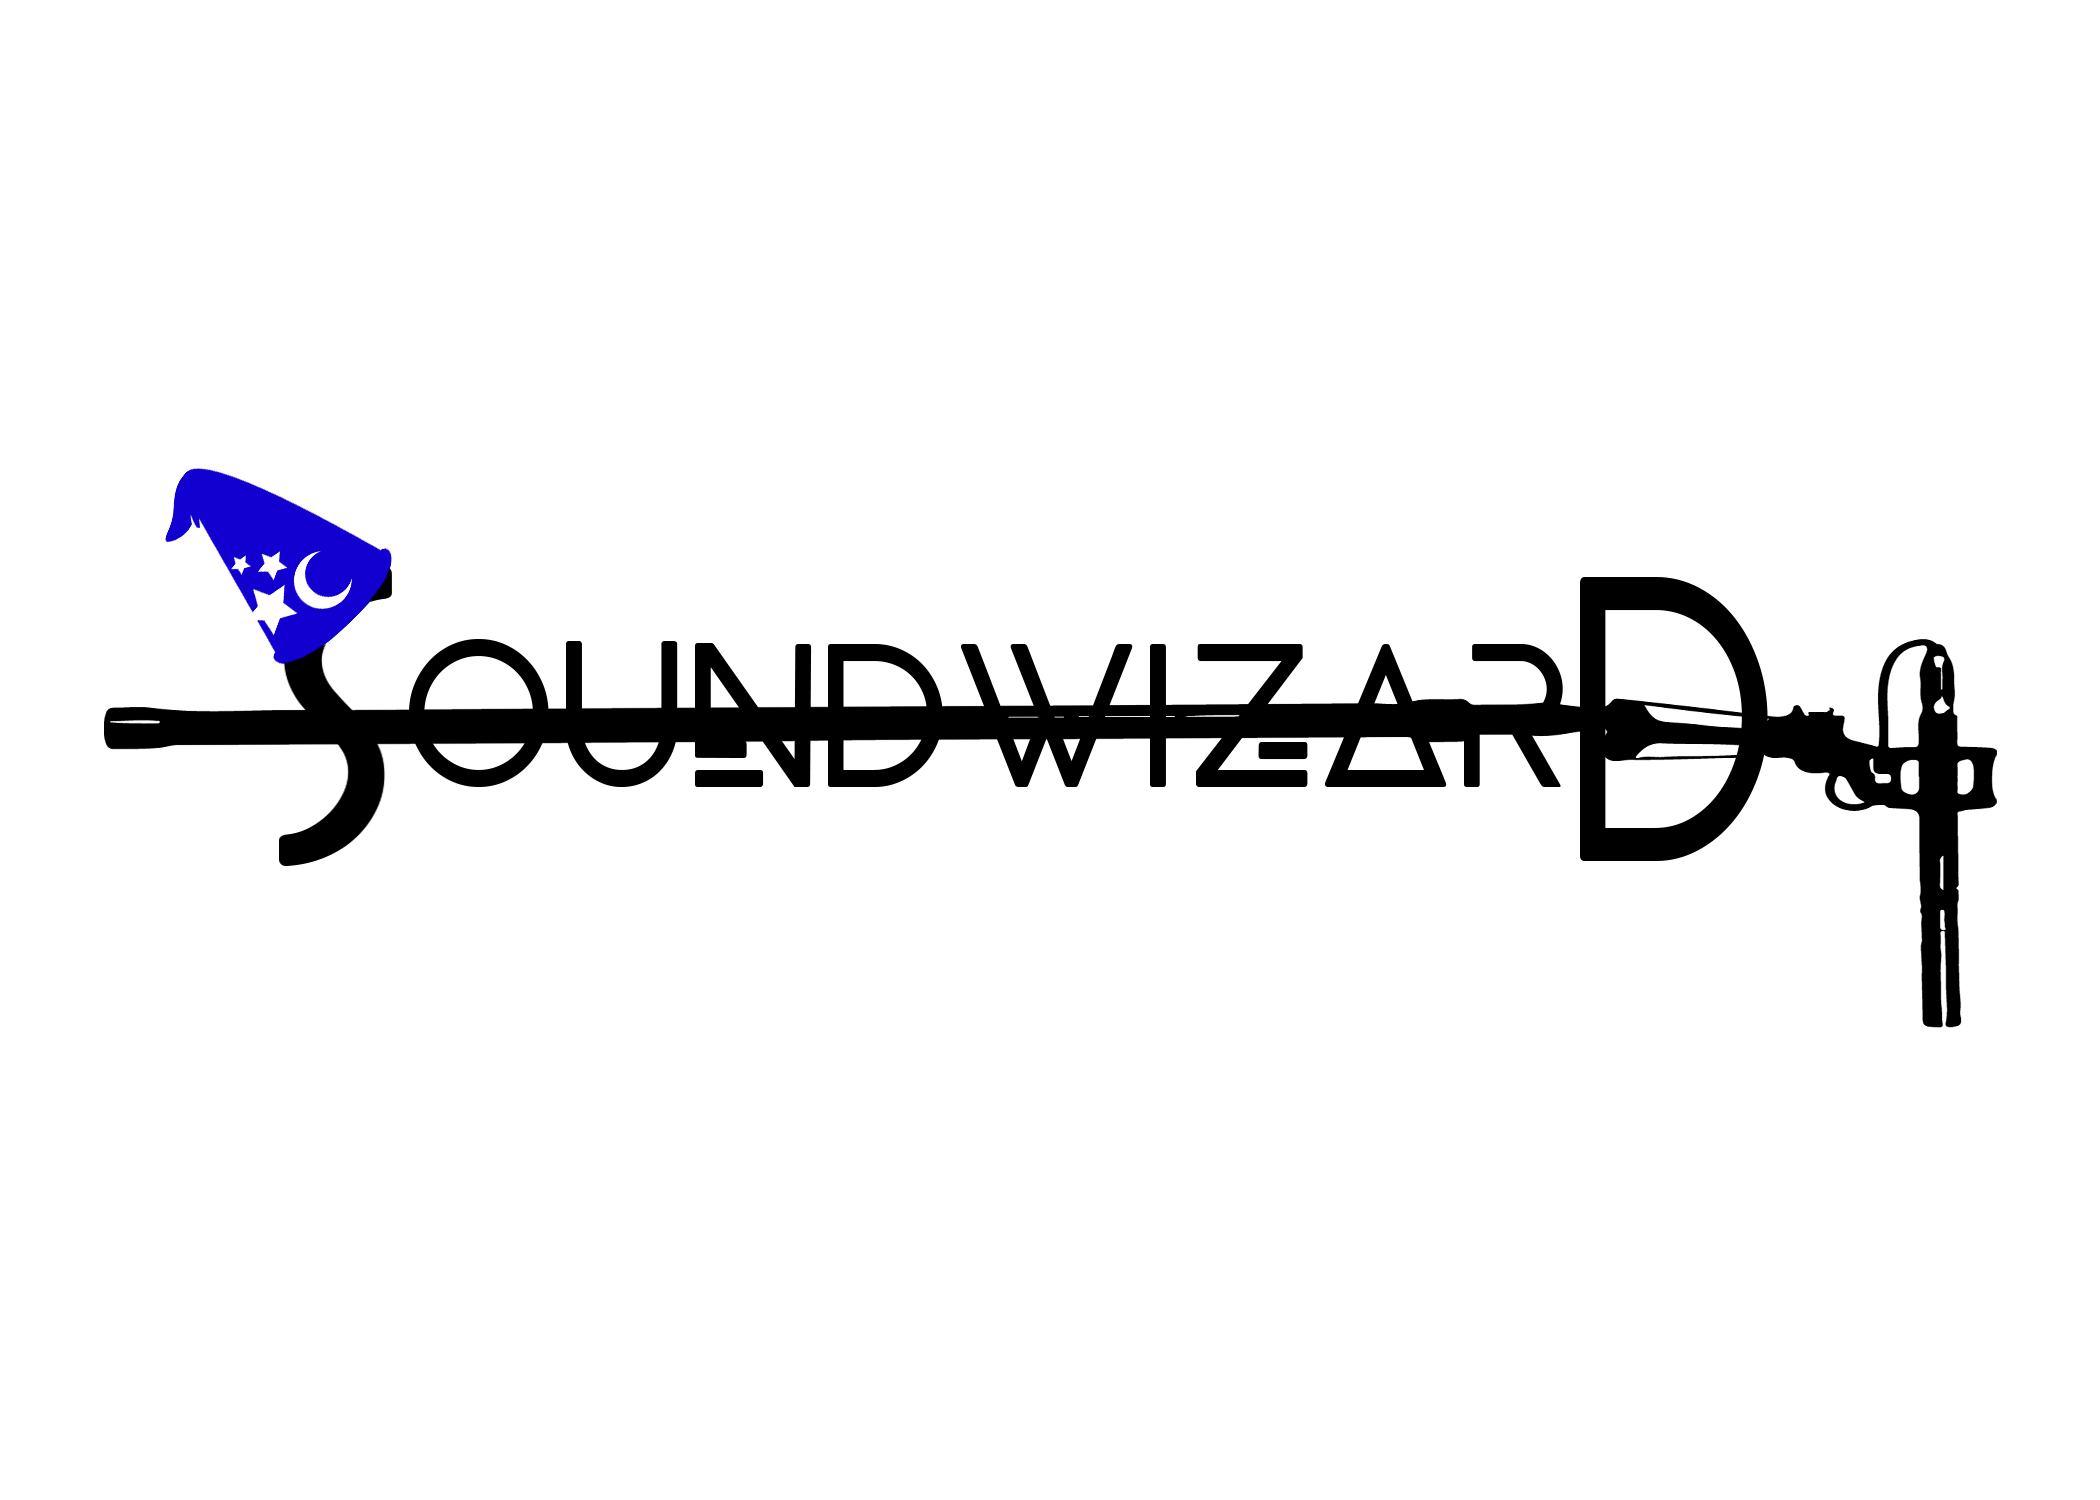 Home [www.soundwizardllc.com]